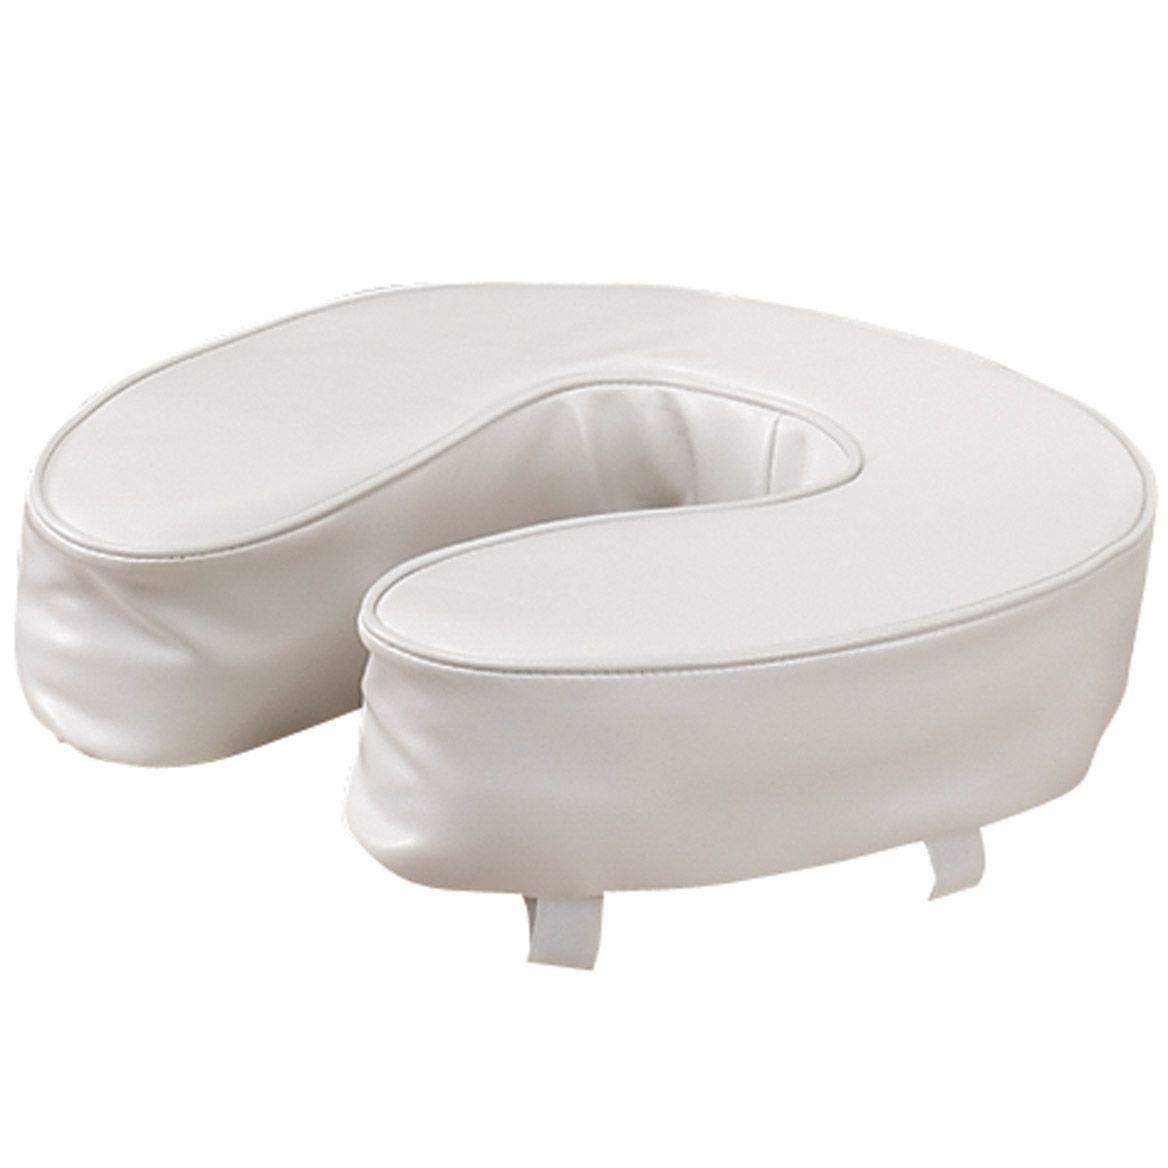 Padded Toilet Seat Cushion-345467